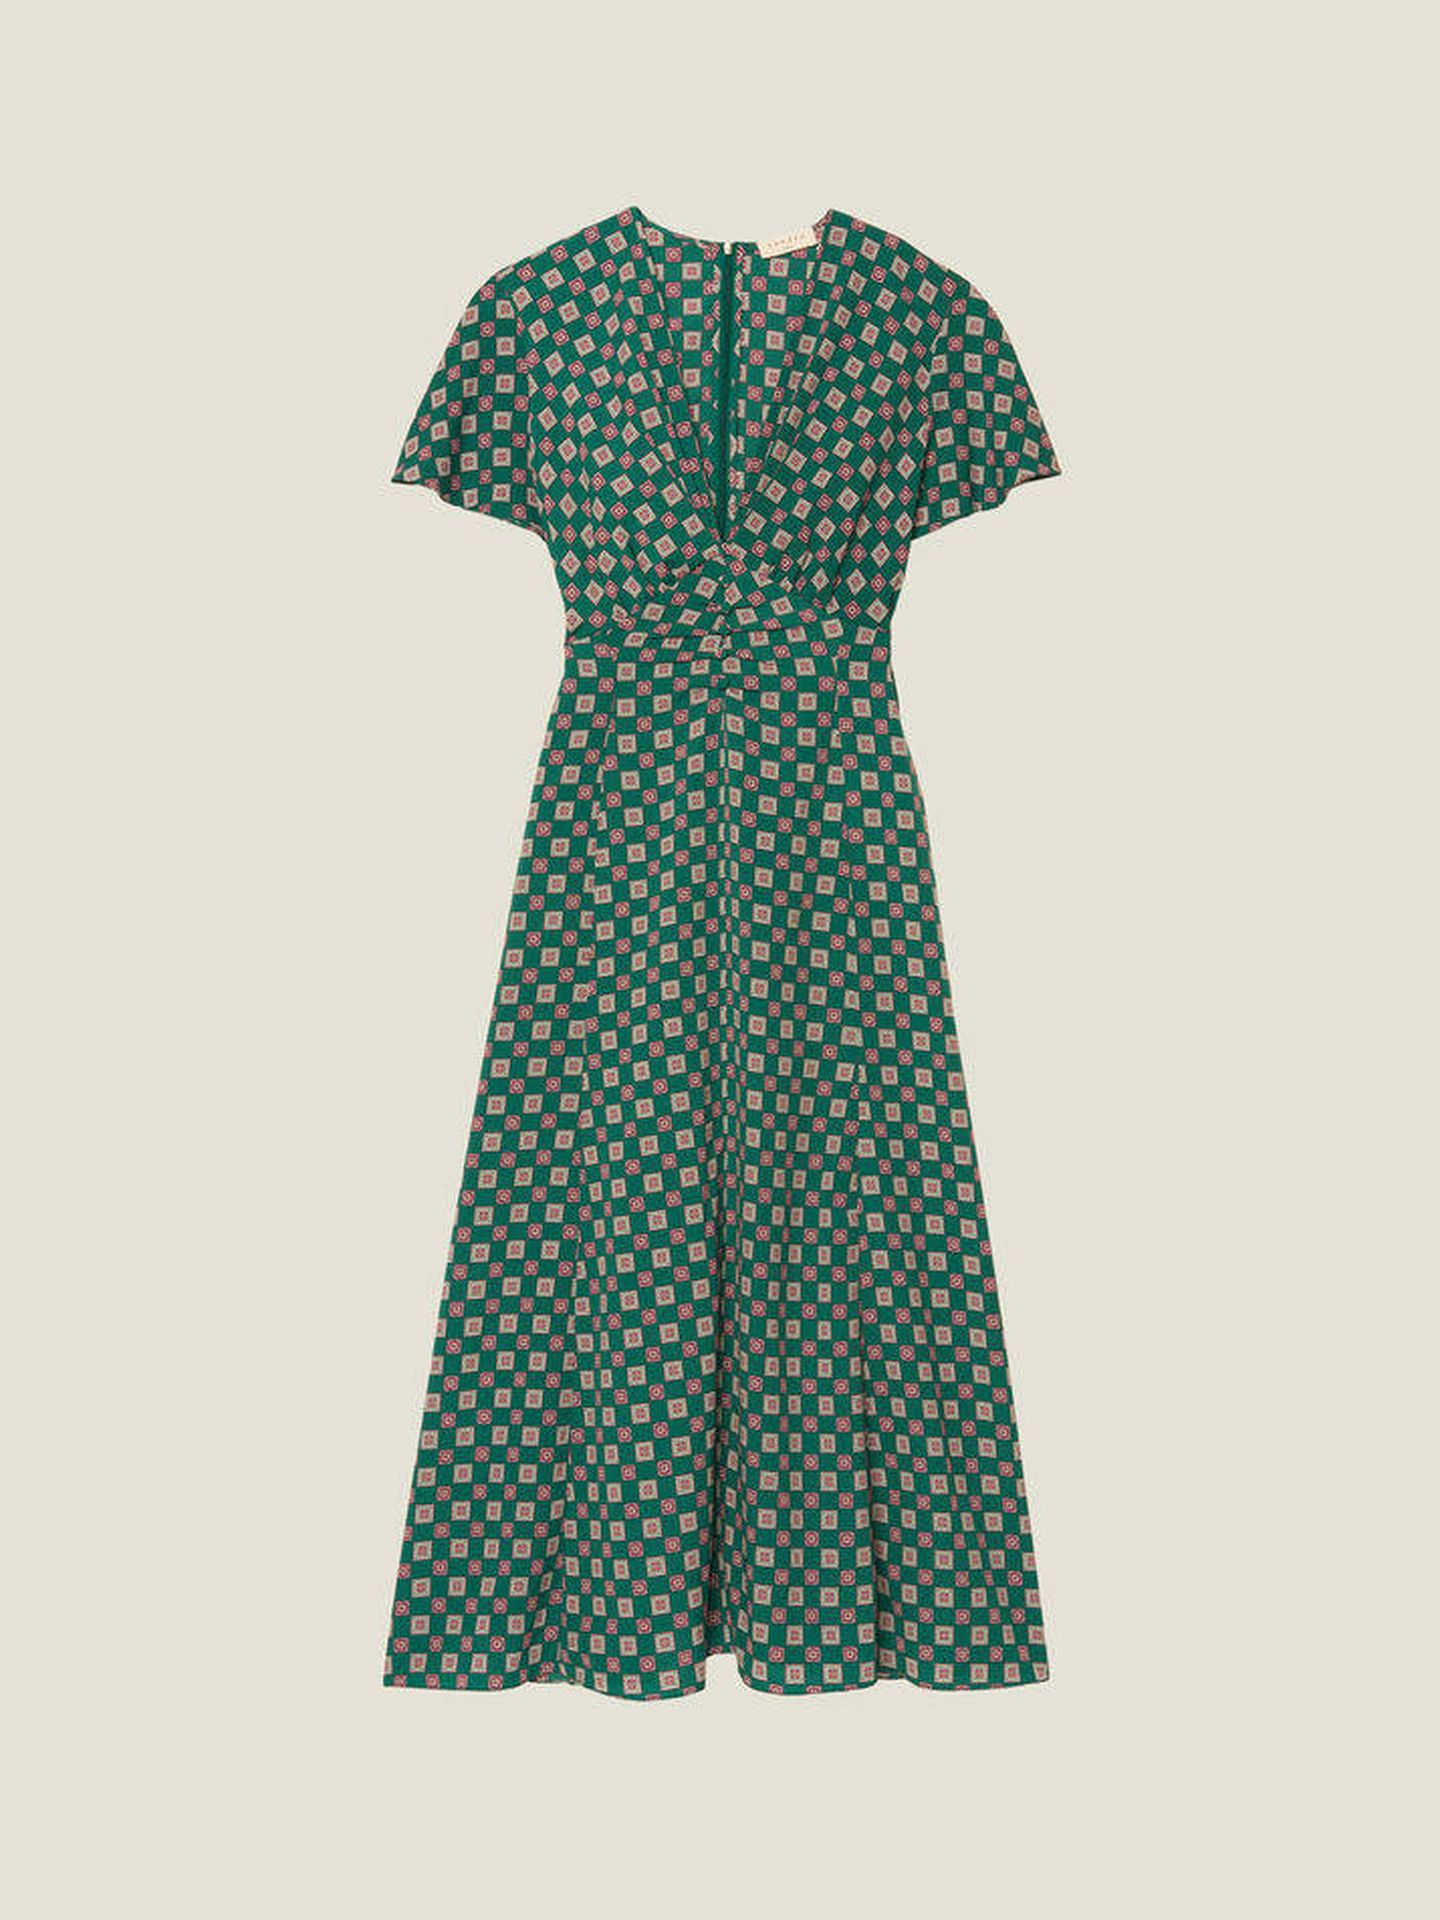 Vestido que ha lucido este lunes Kate Middleton. (uk.sandro-paris.com)